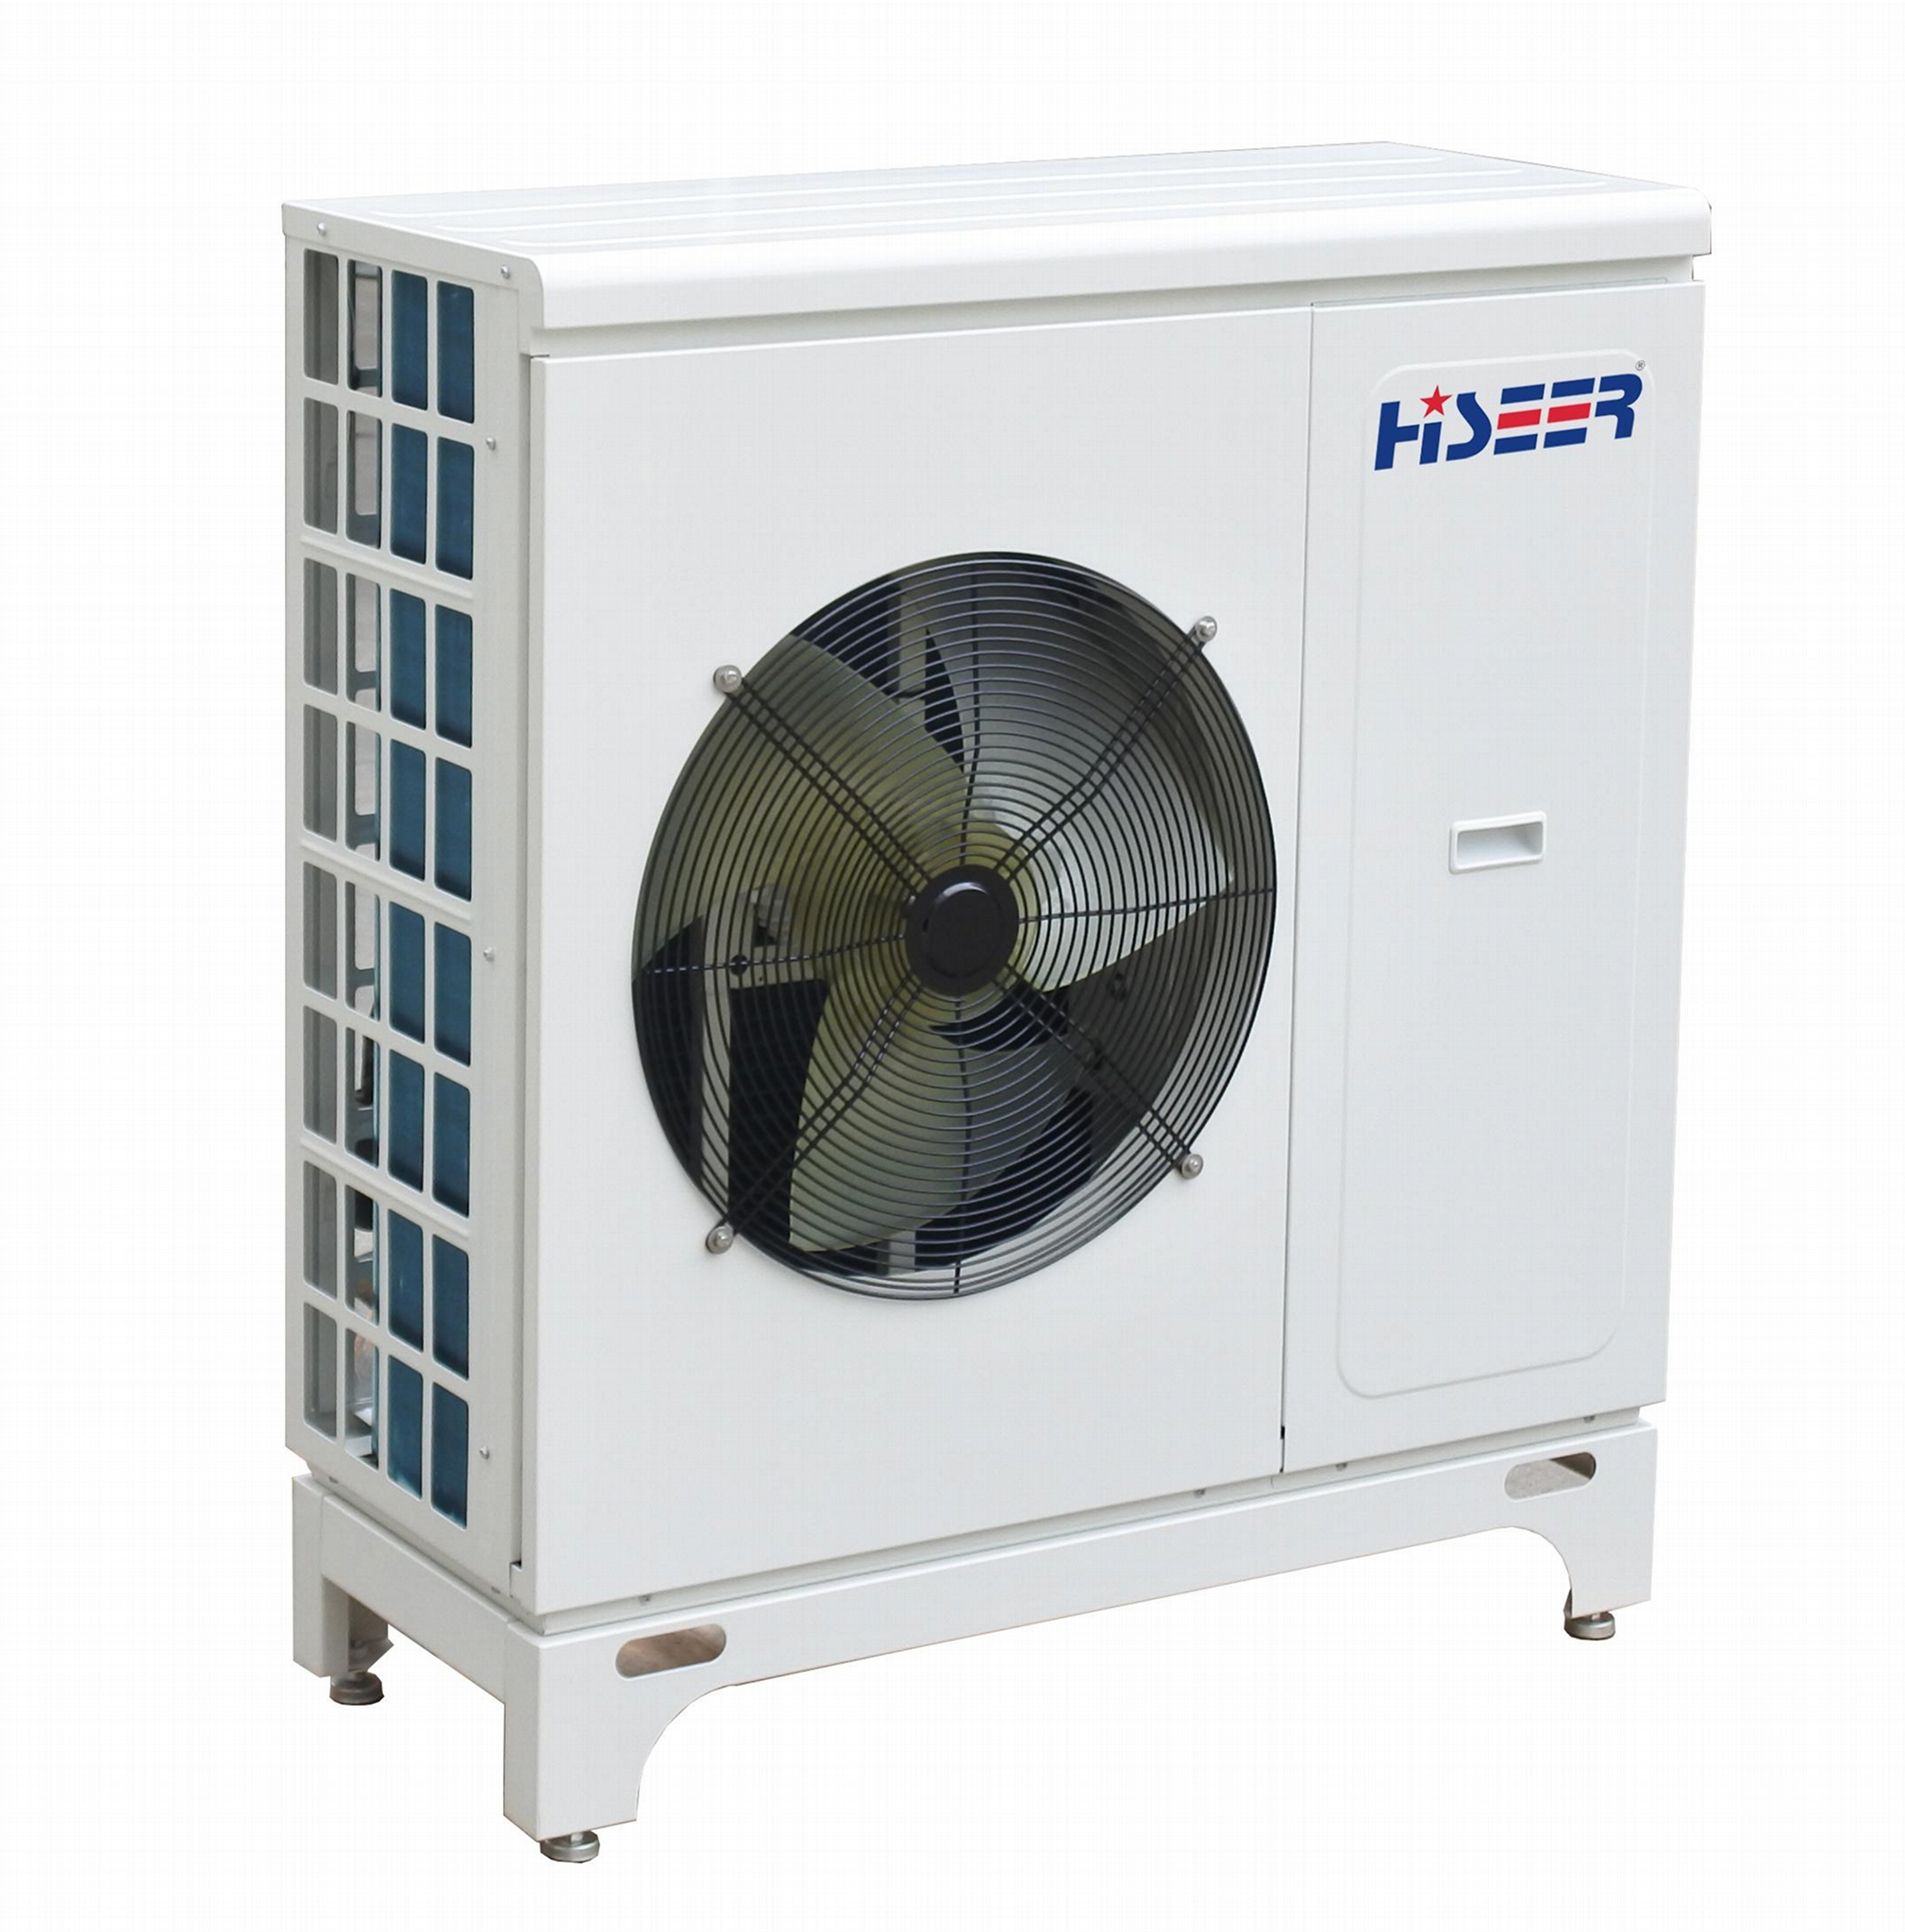 Inverter heat pump workable ambient temperature range